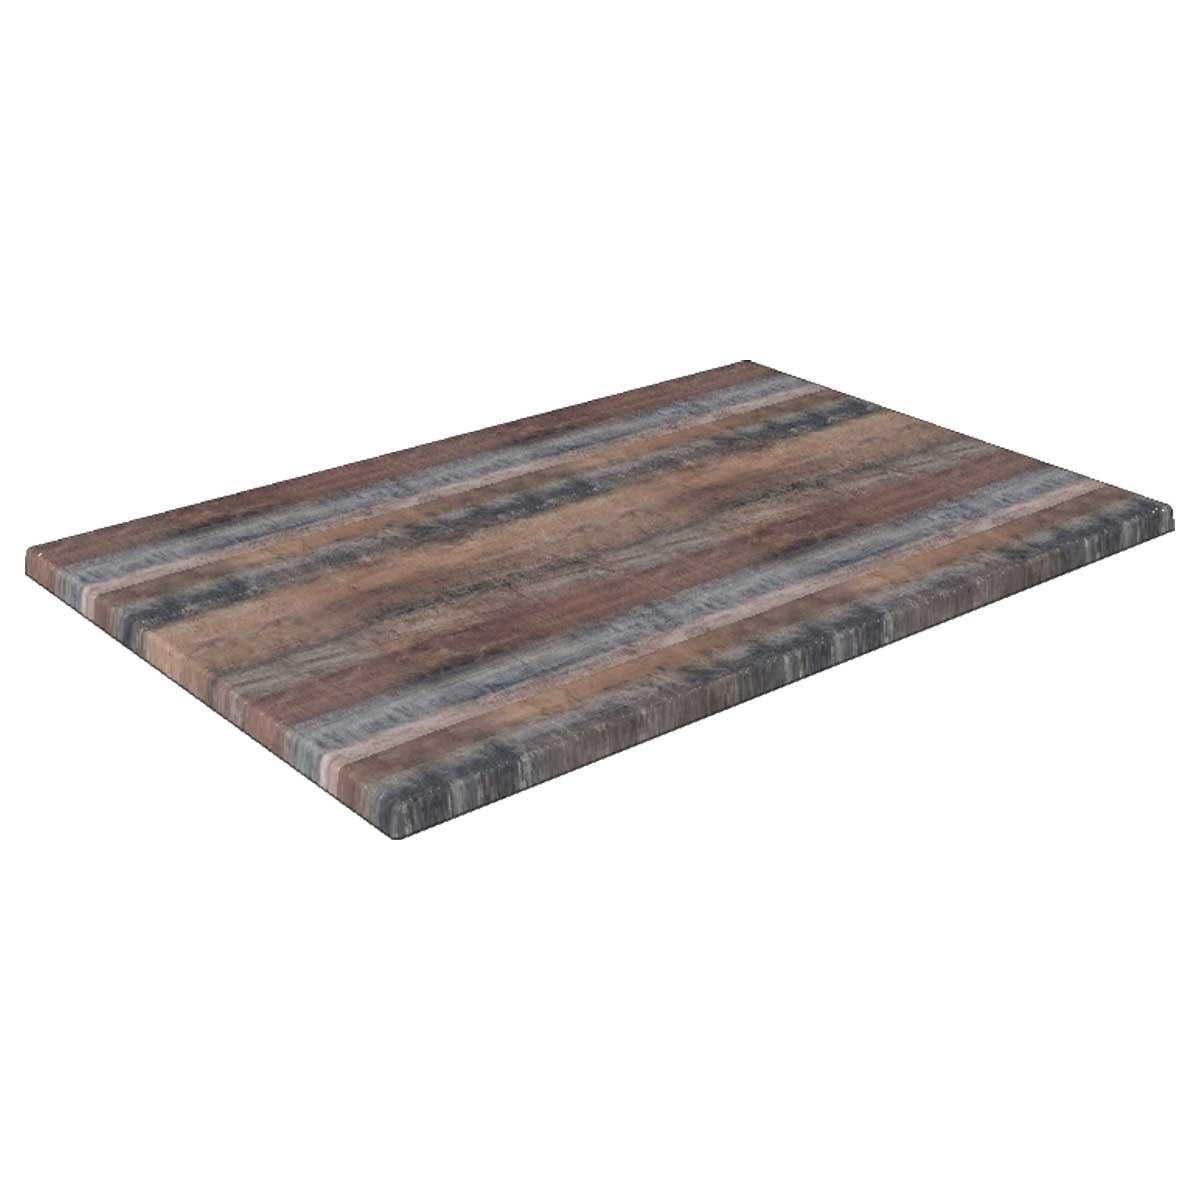 TICLA E120X80 119 - https://www.werzalit.com/fr/produit/plateau-de-table-classic-werzalit-e-120x80-119-arizona/